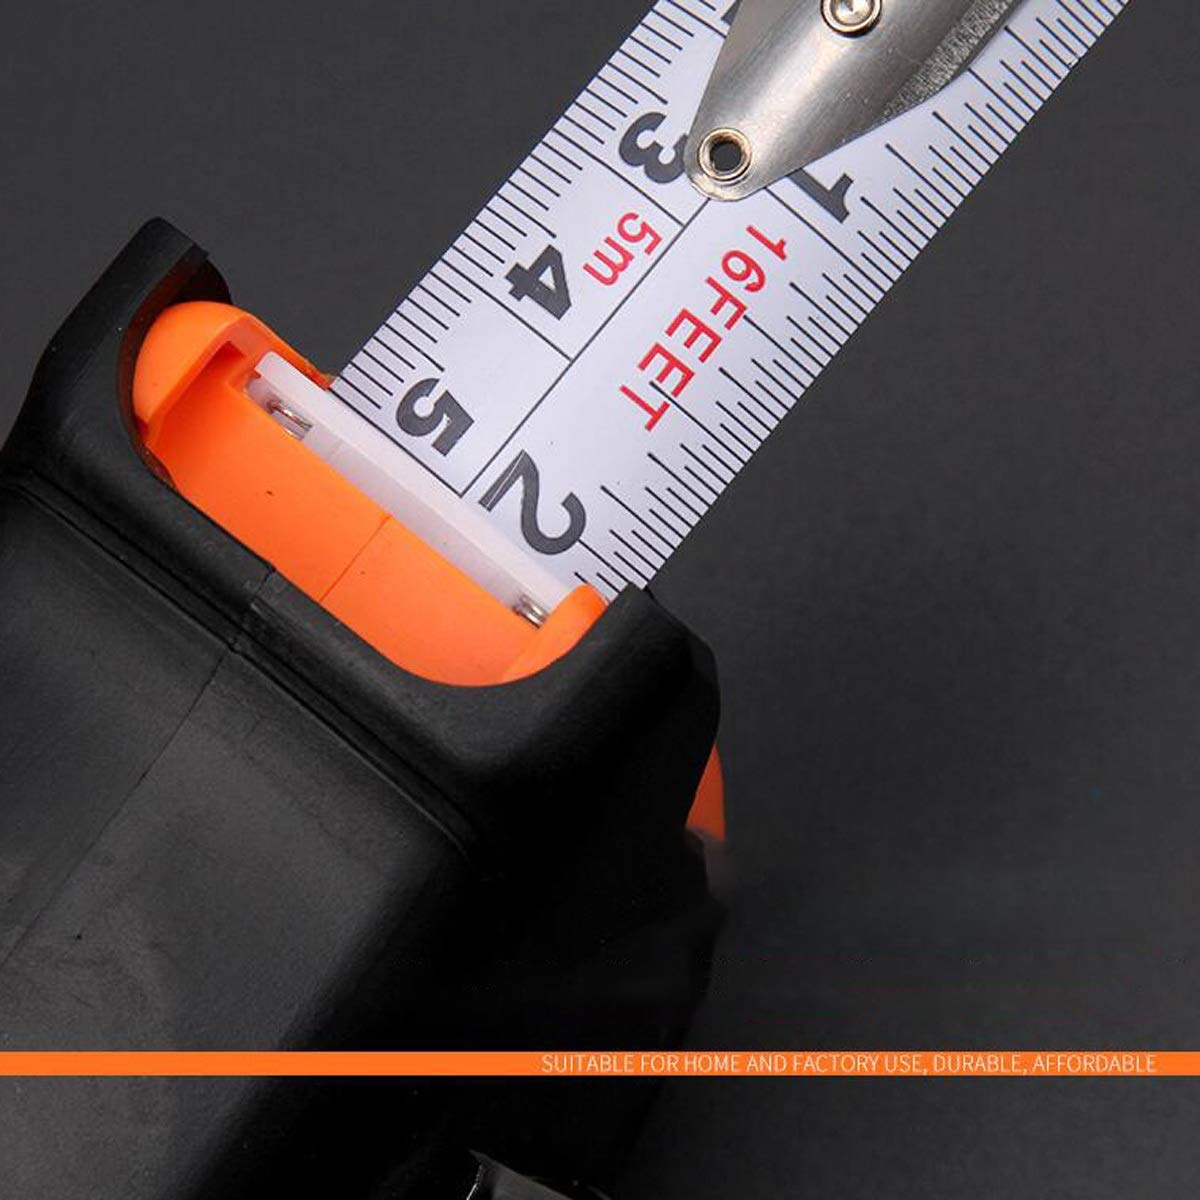 Steel Tape Measure 3 M 5 M 7.5 M Box Ruler Woodworking High Precision Measurement Tool Meter Ruler Double Scale MUZIWENJU Ruler Color : Black, Size : 3m